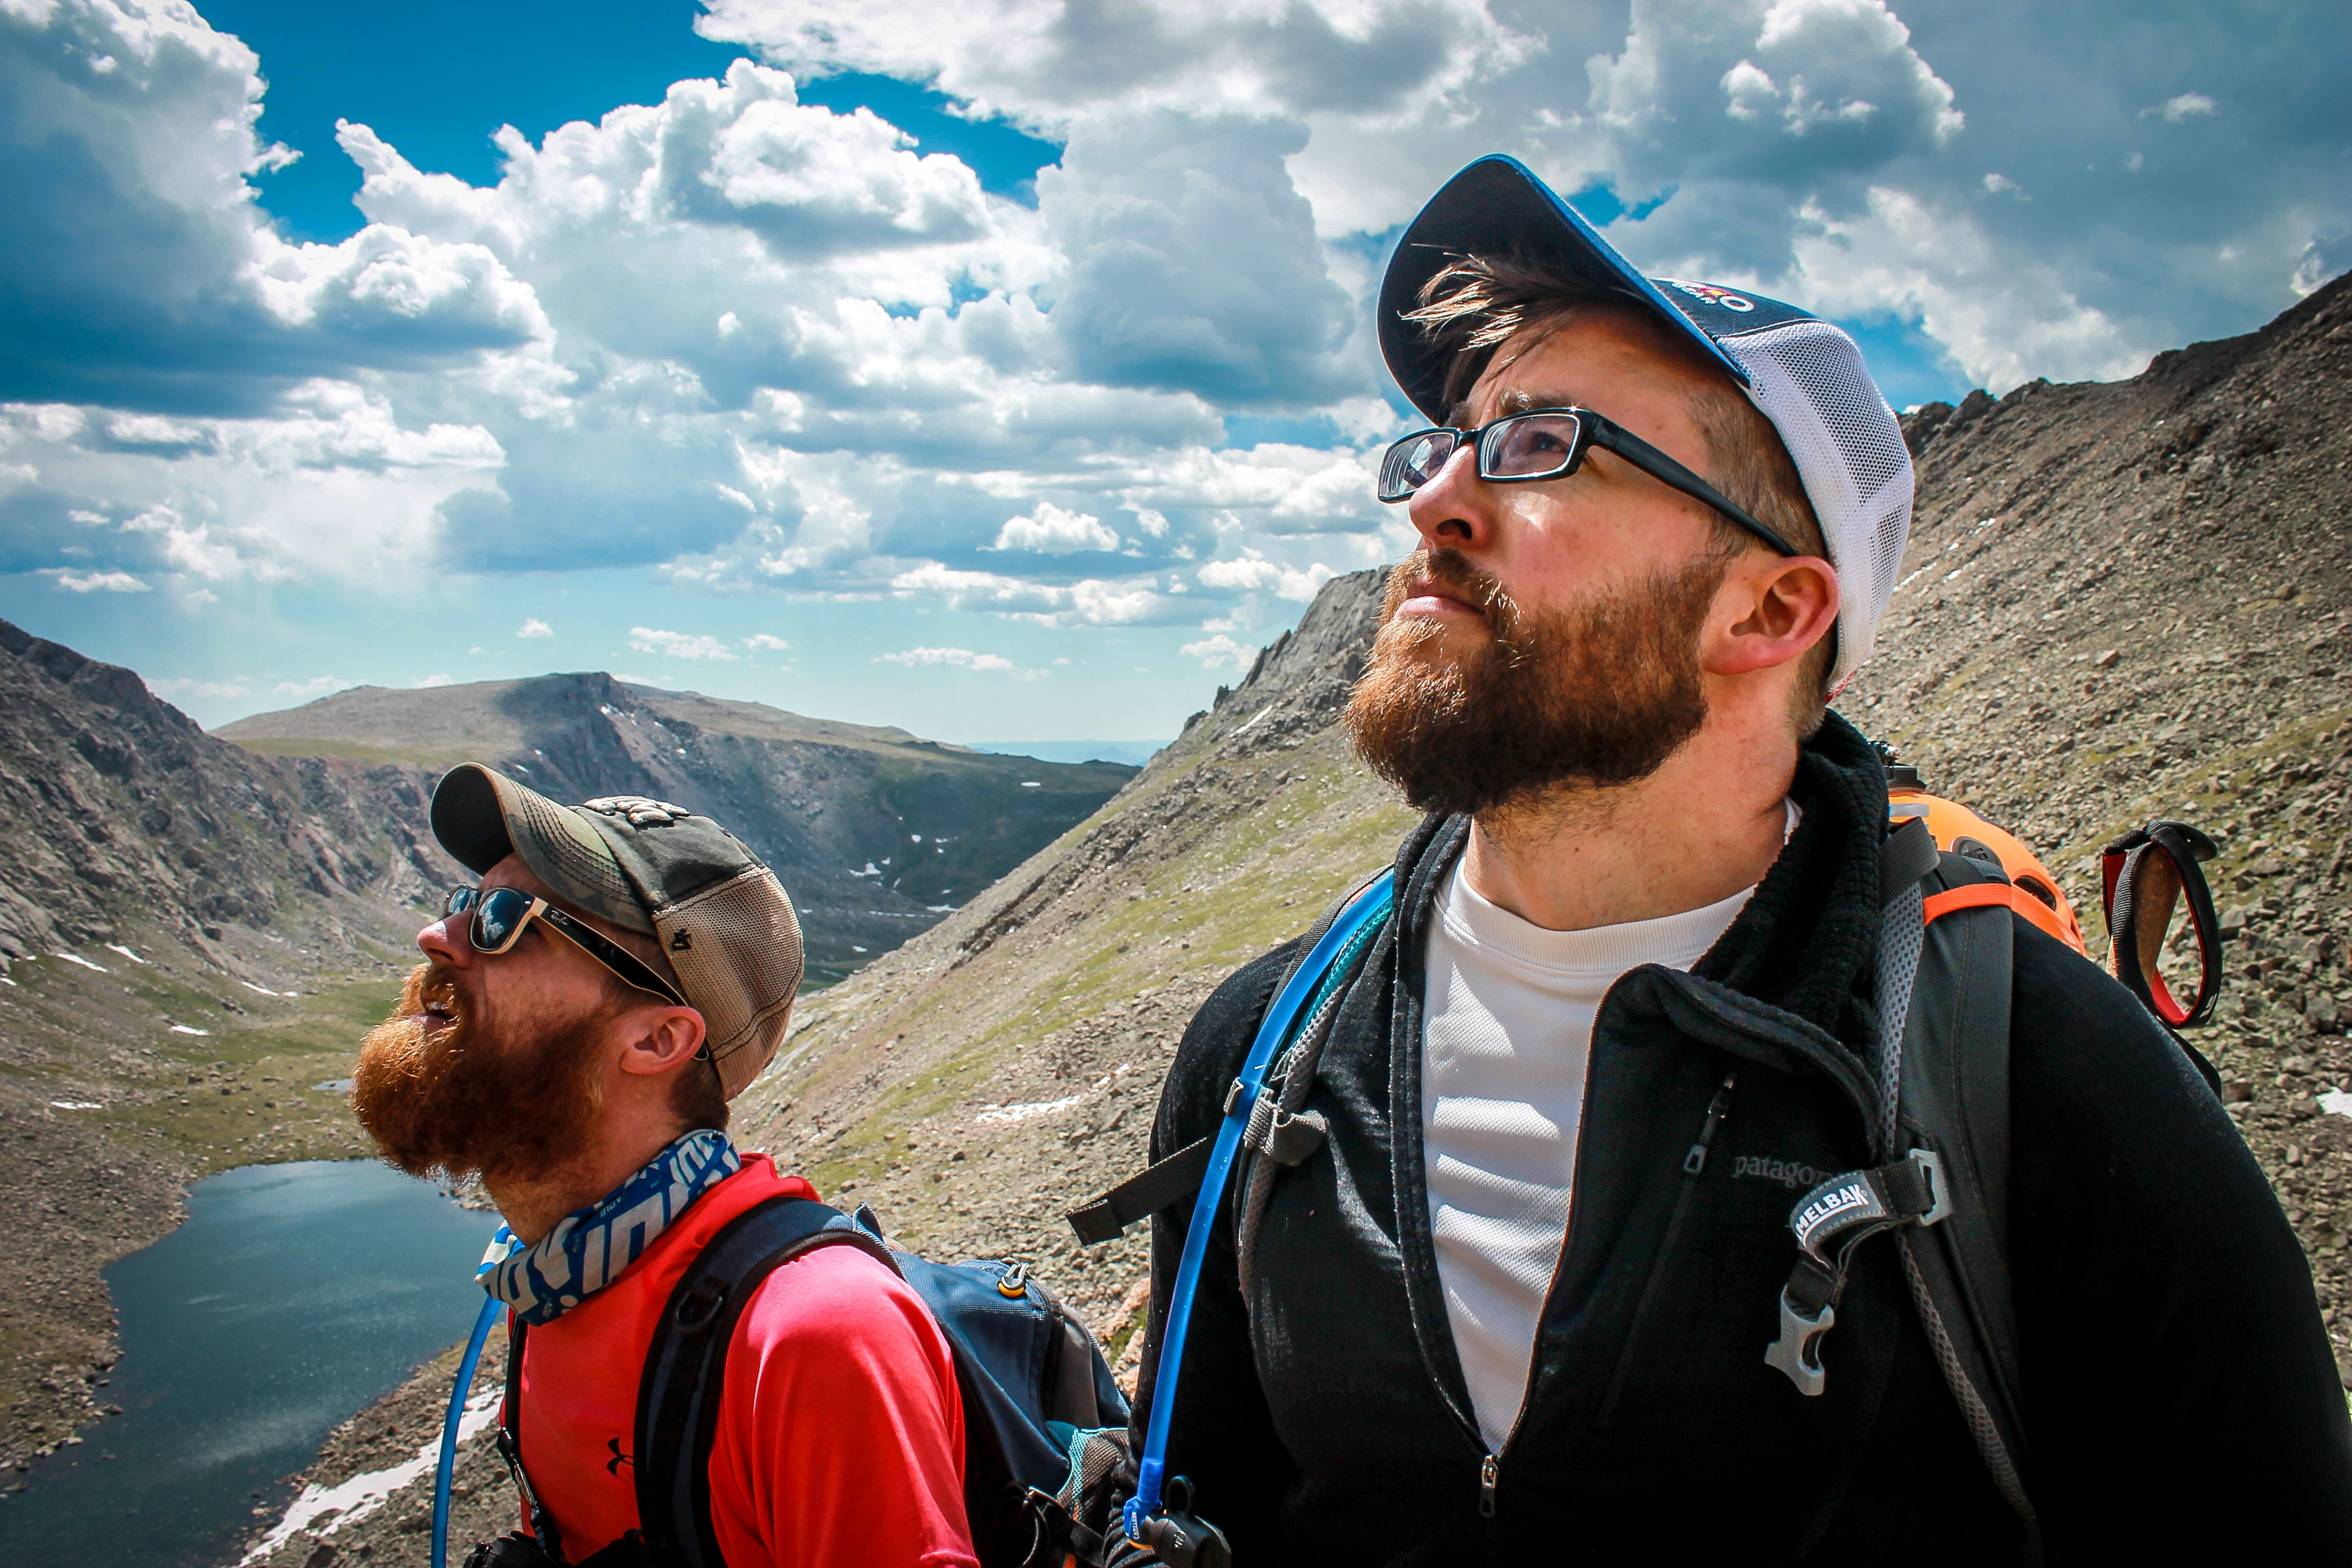 men climbing mountains together sharing bonding experience